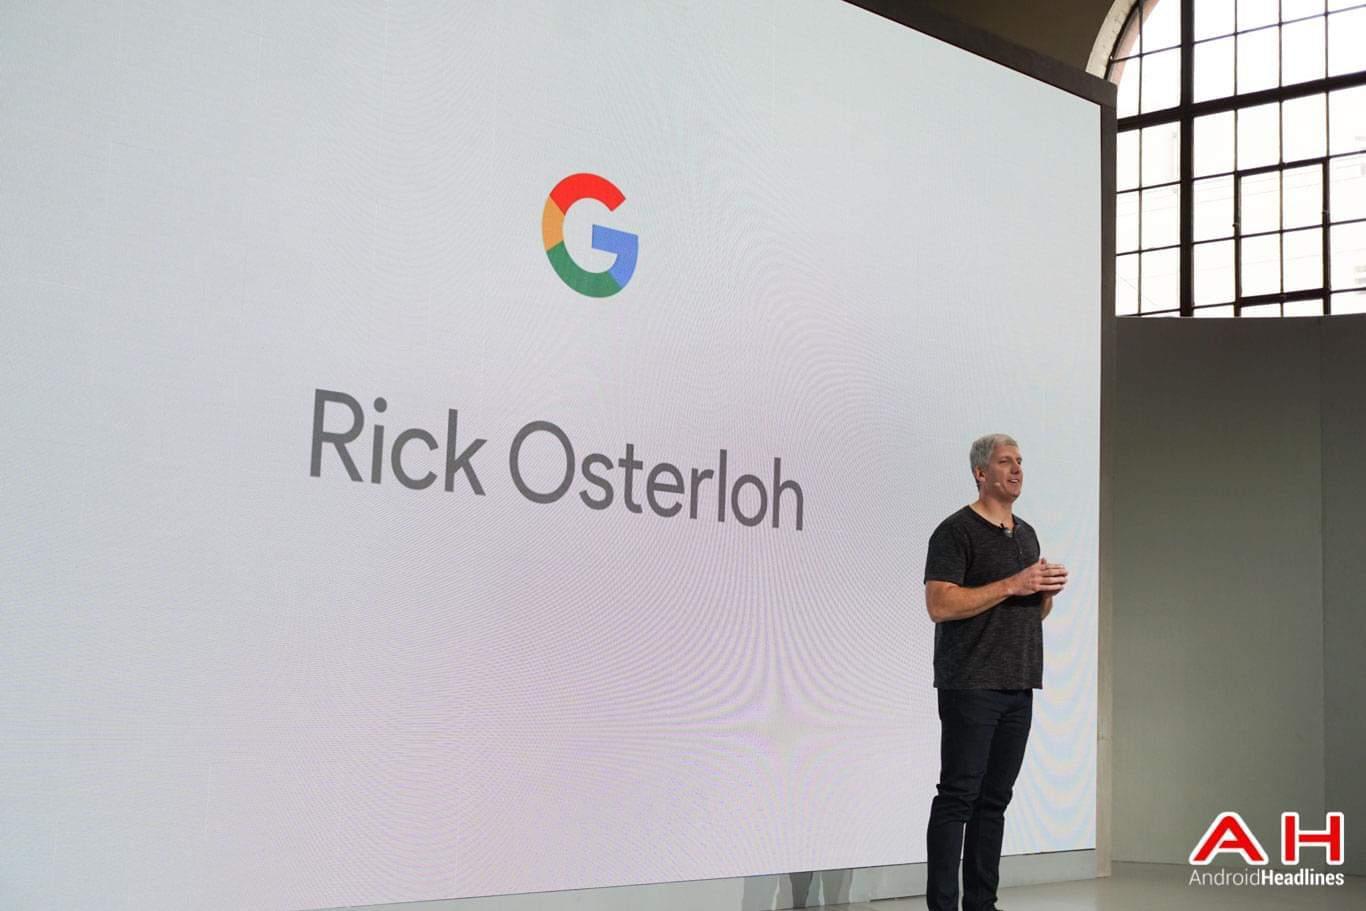 Rick Osterloh AH 1